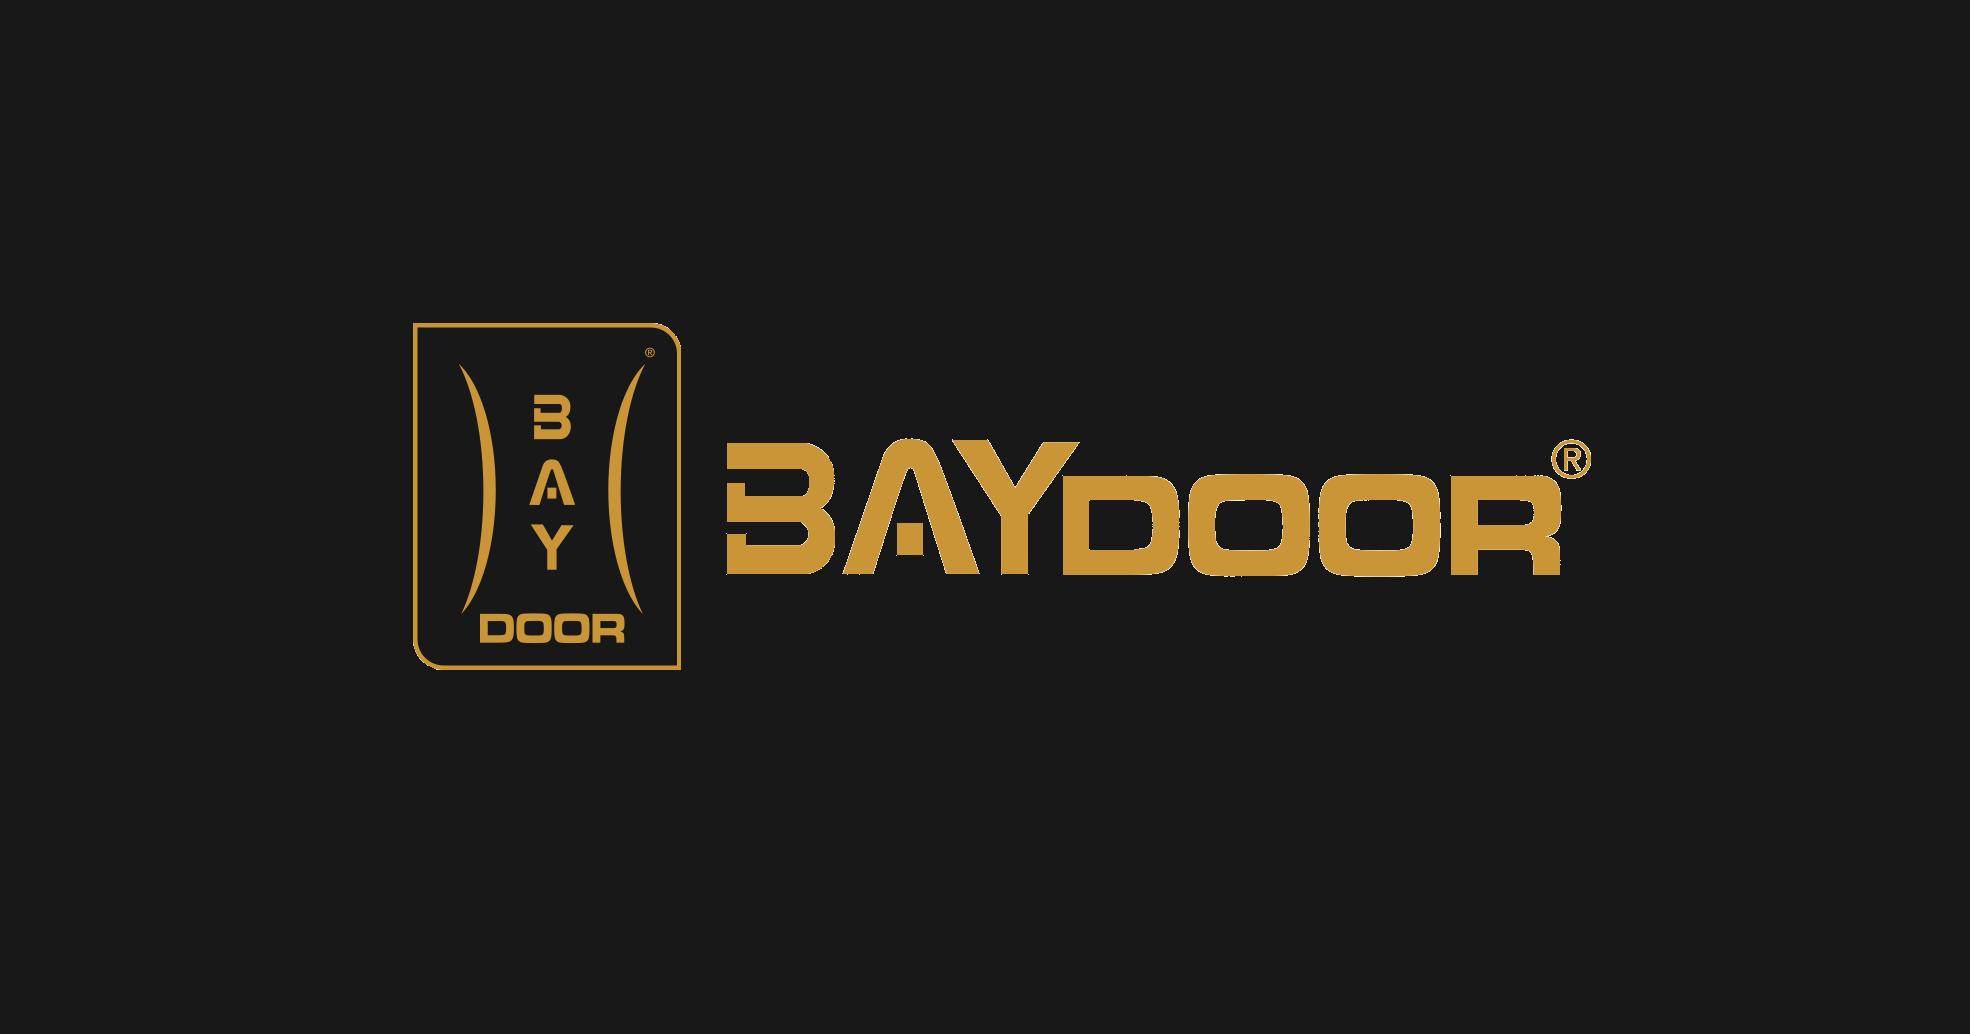 BAYDOOR - MOTIF MUTFAK MOB. SAN. VE TIC. LTD. STI.